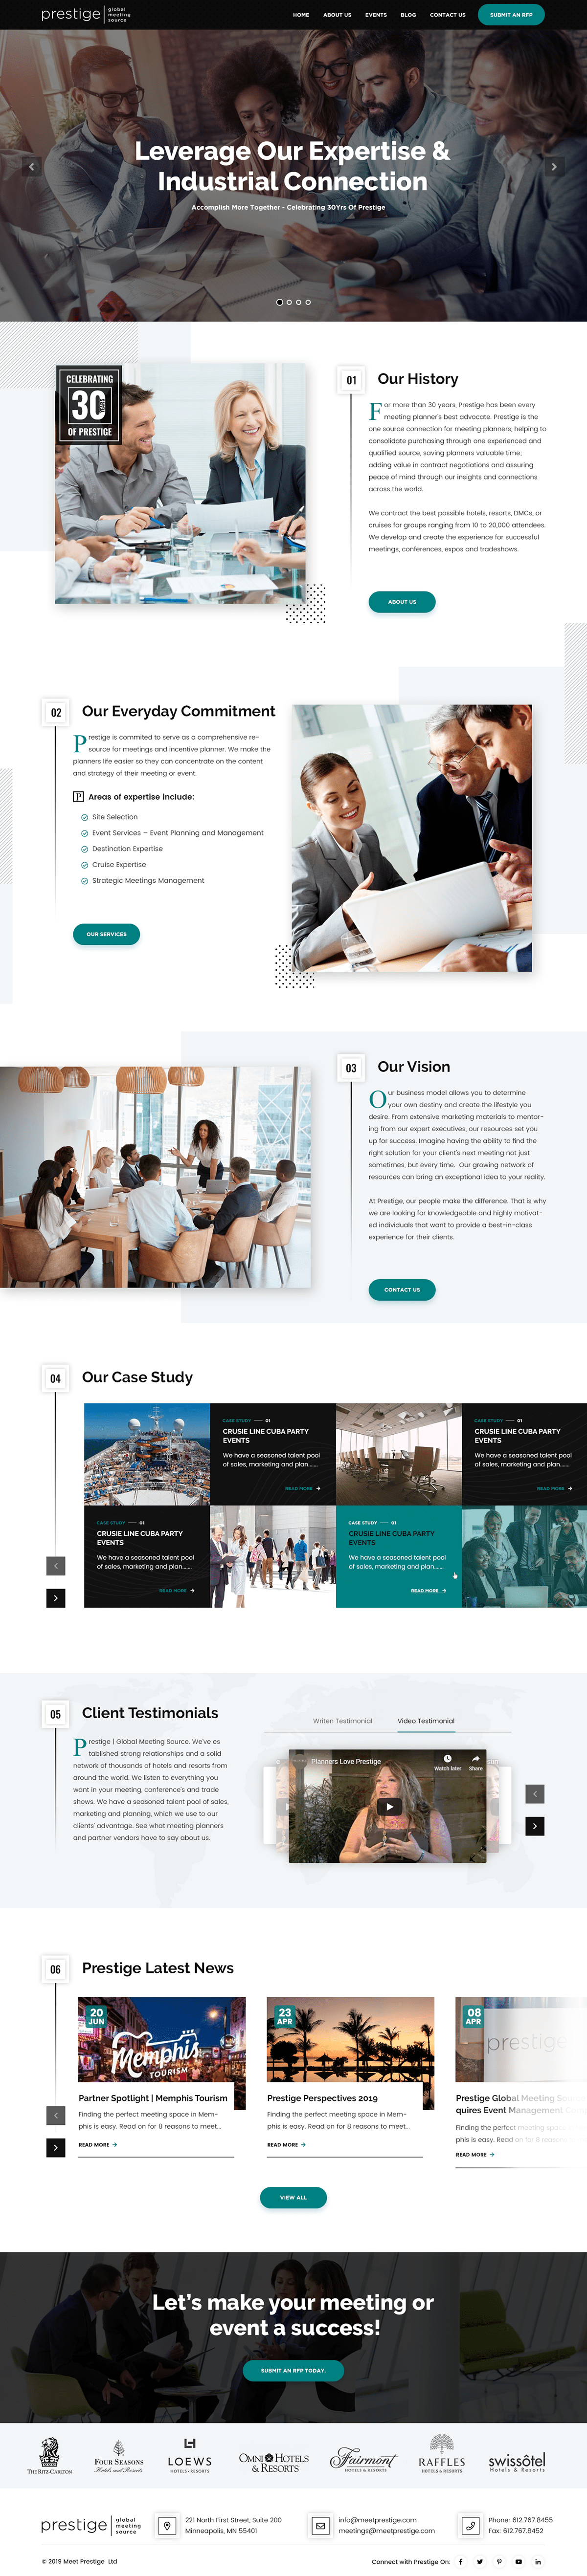 clean website Consultancy Design corporate creative website design landing page minimalist design modern website Professional website ui design